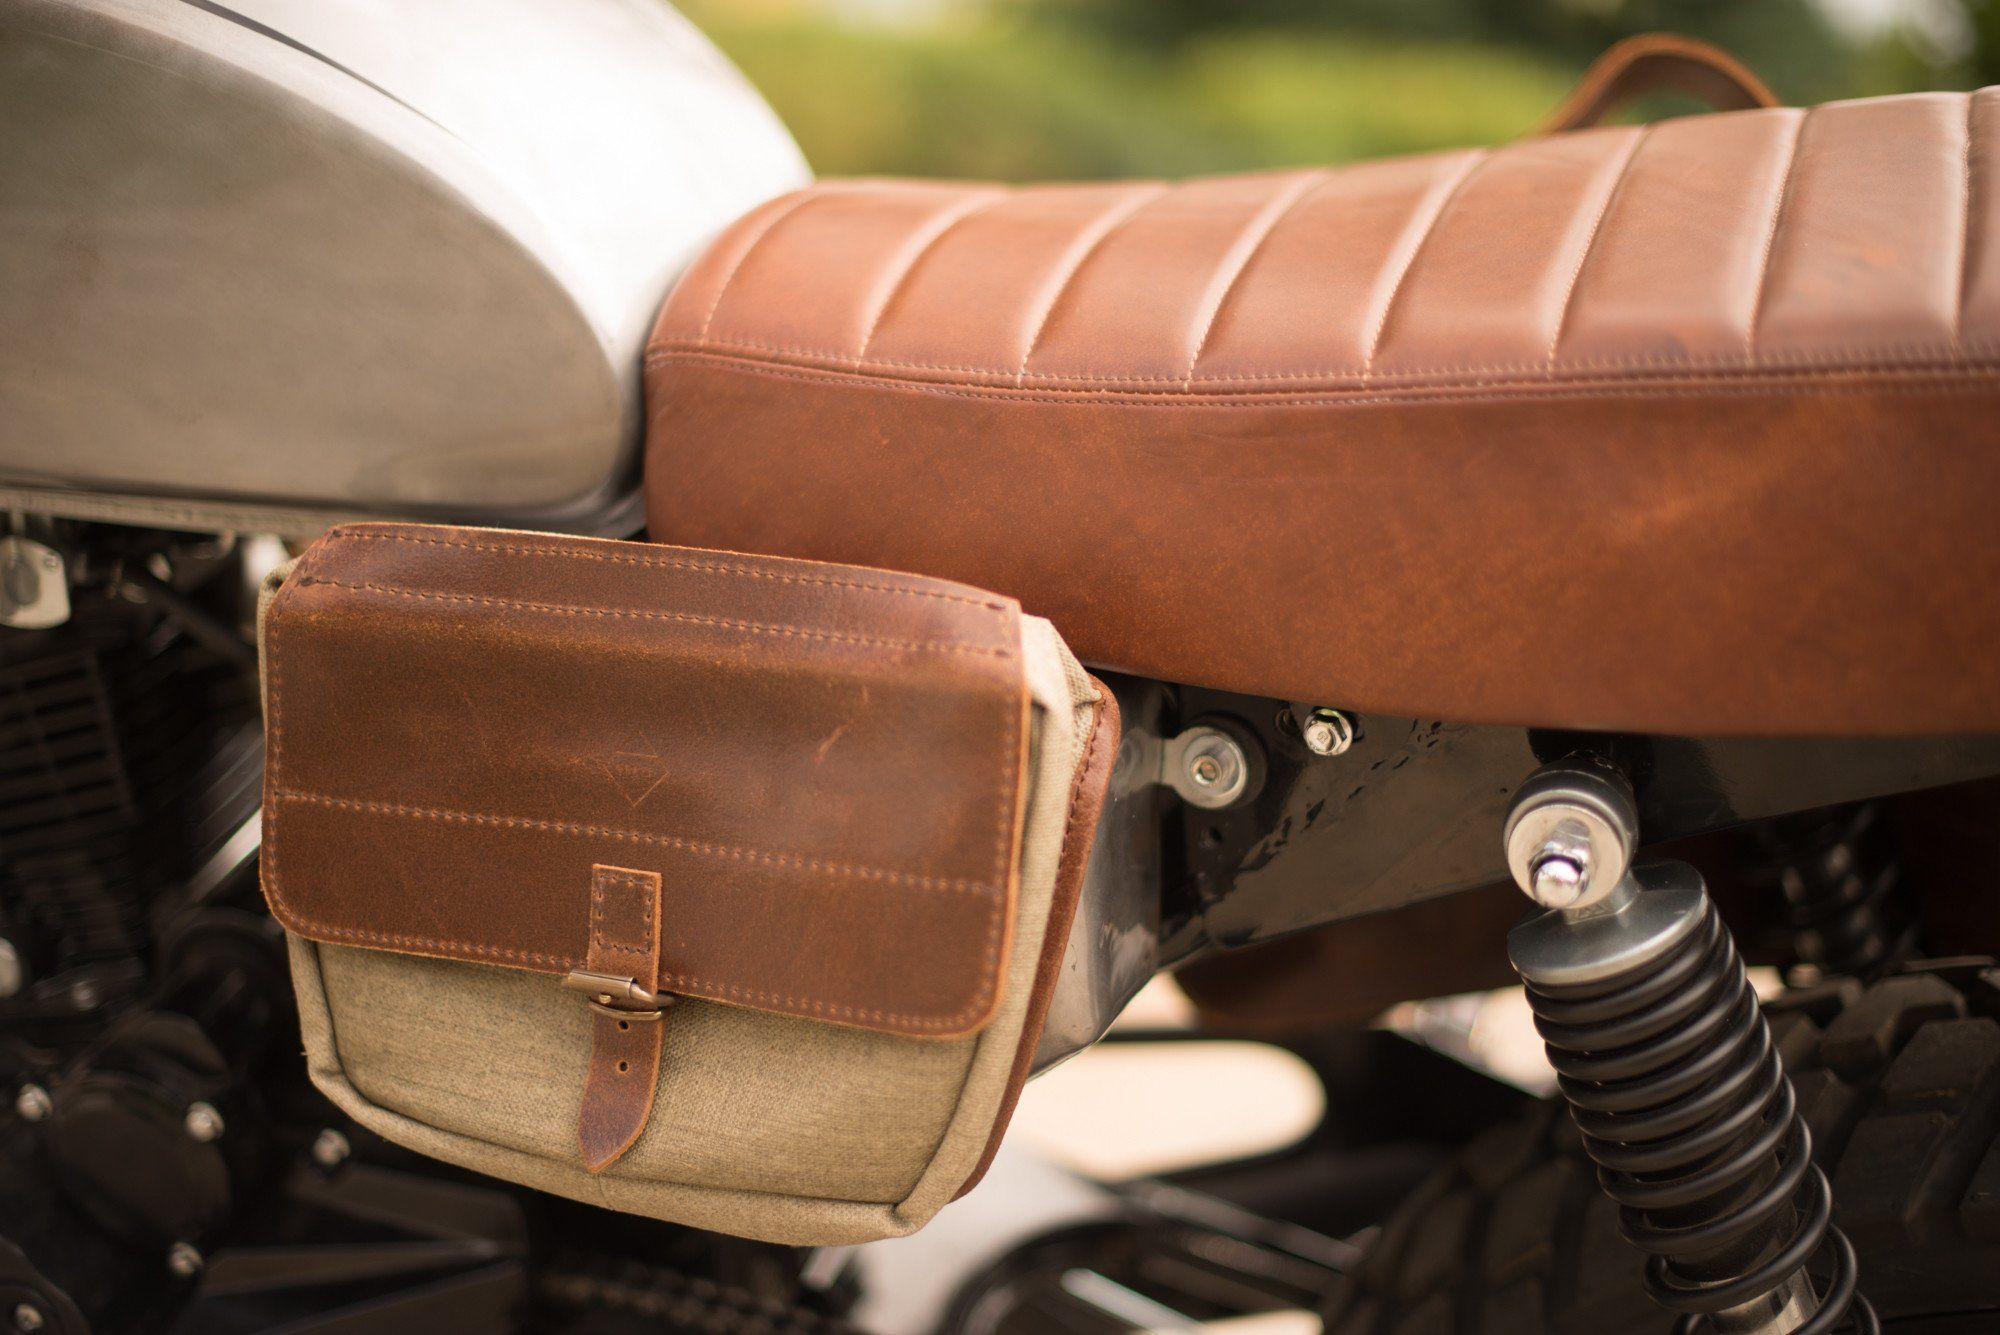 Handcrafted Genuine Leather Bag Saddle Handlebar Moto Bike Motorbike Moped